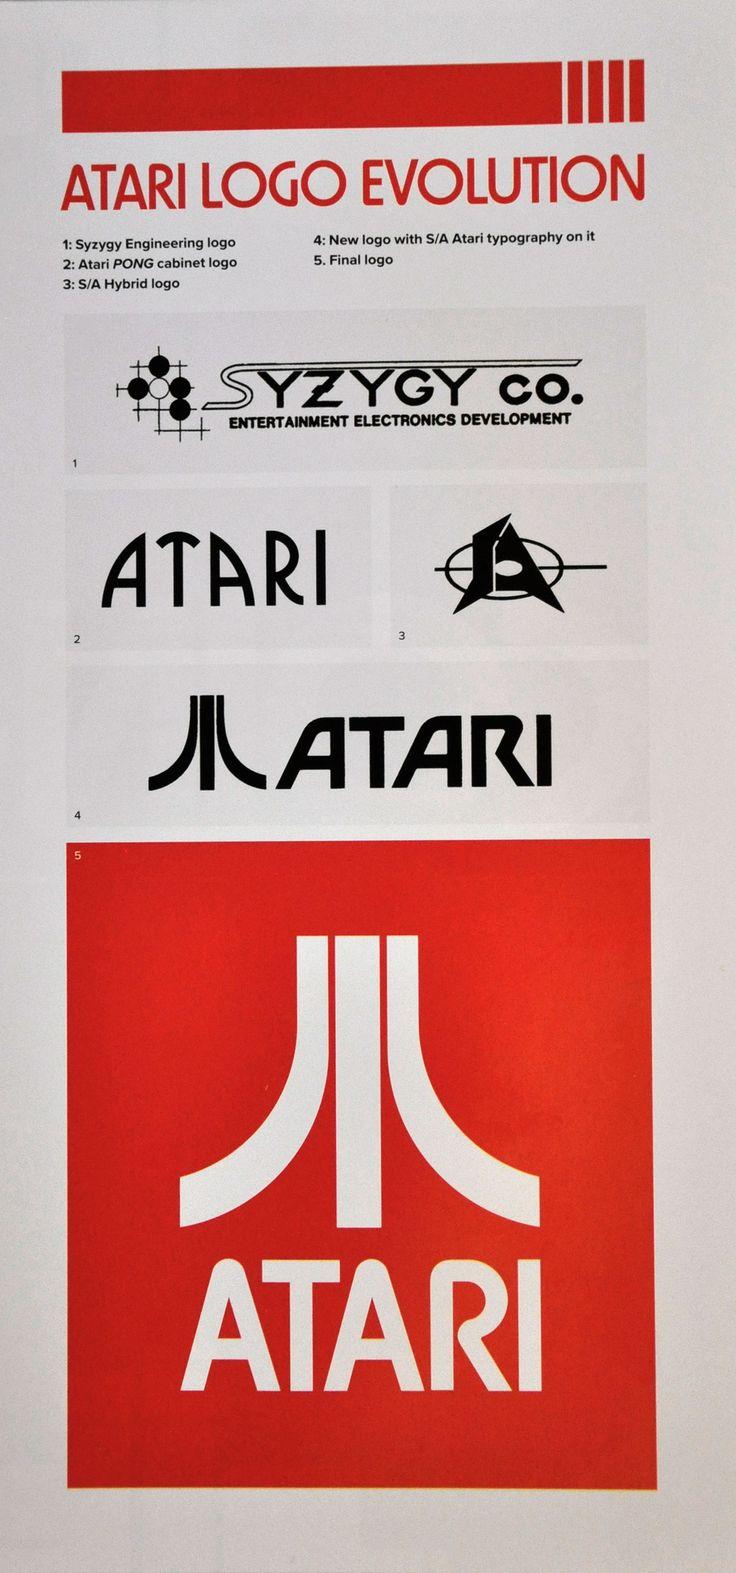 Atari logo evolution